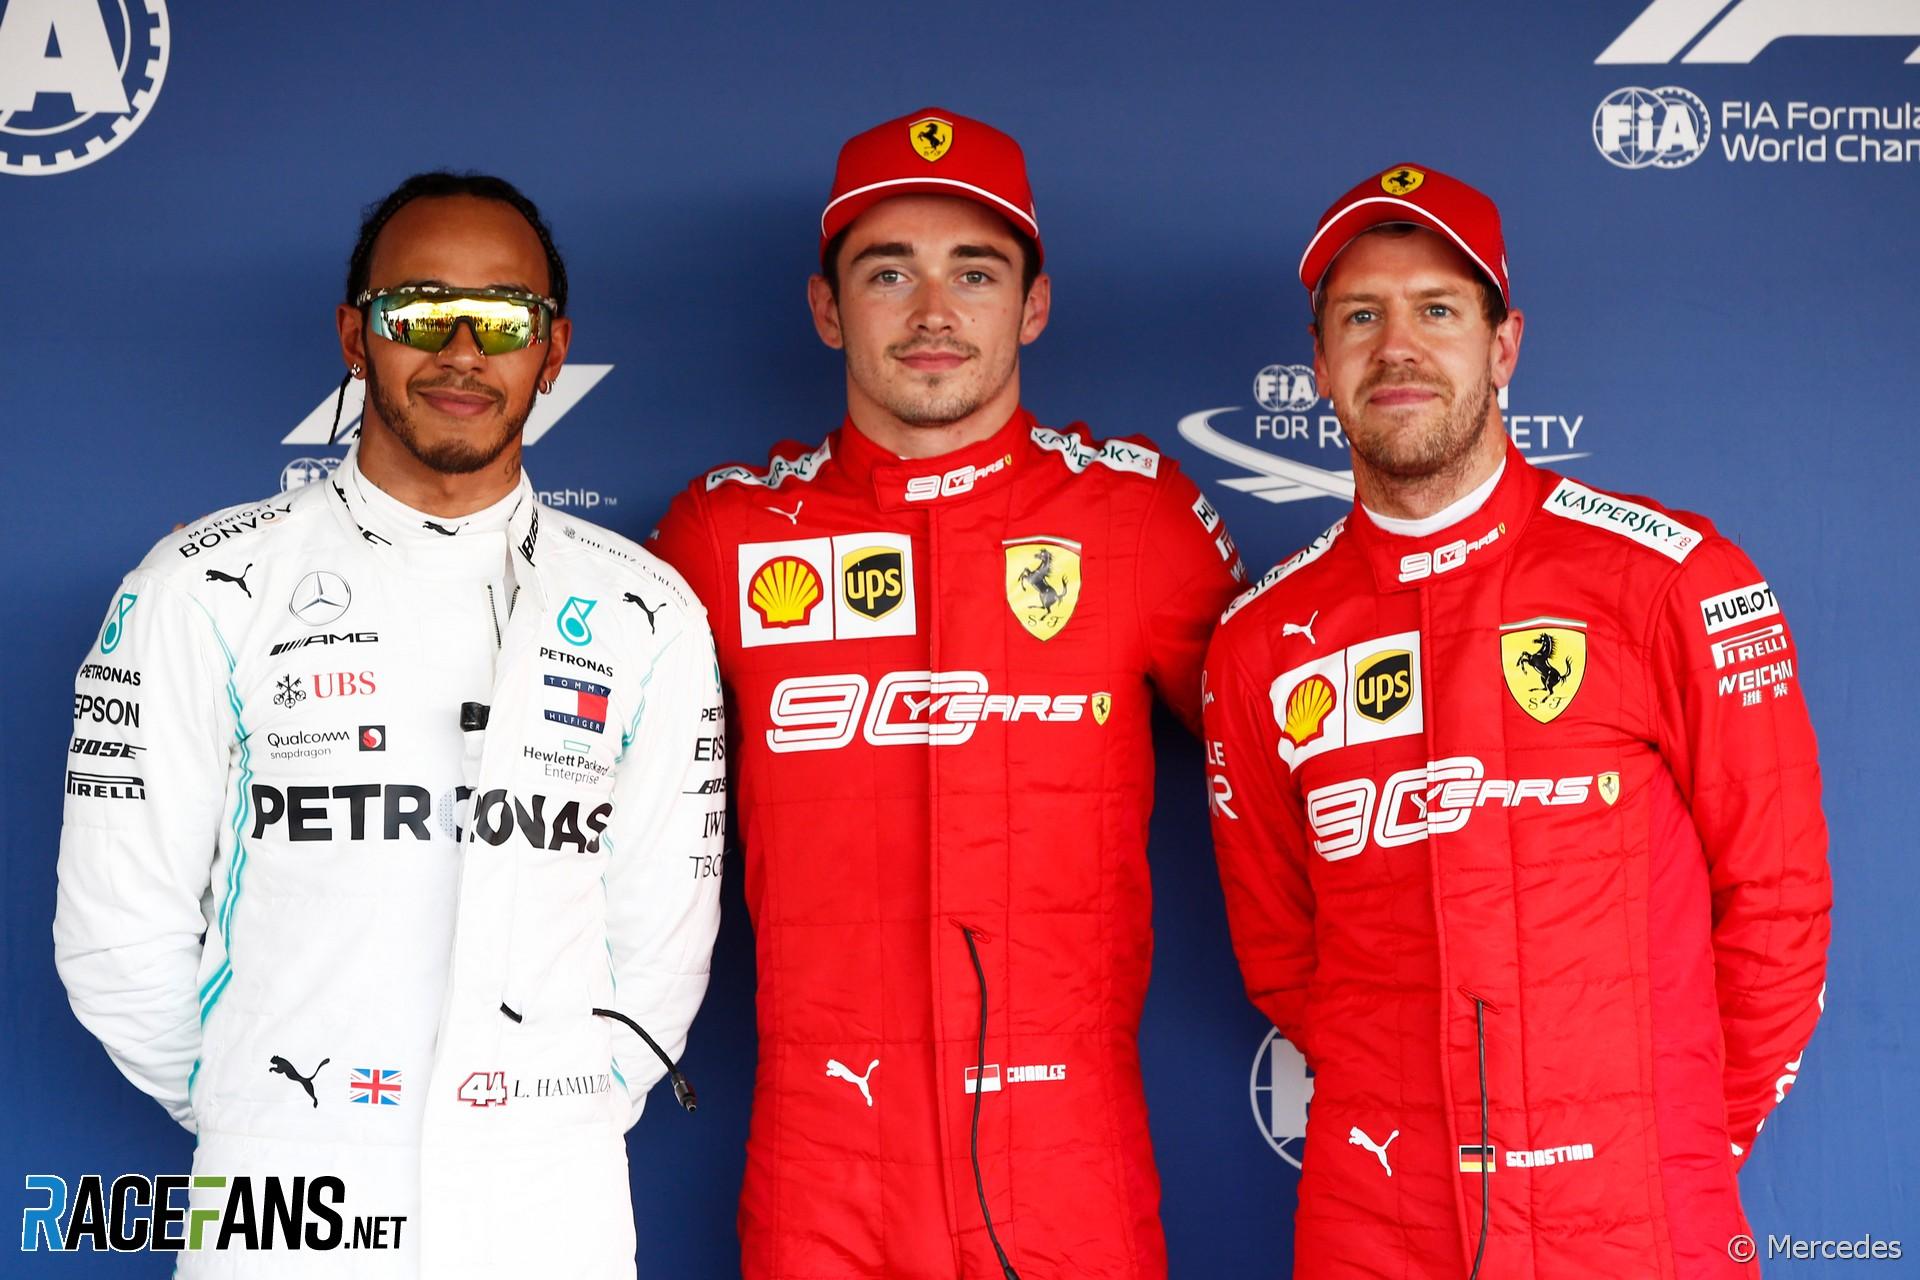 Lewis Hamilton, Charles Leclerc, Sebastian Vettel, Sochi Autodrom, 2019